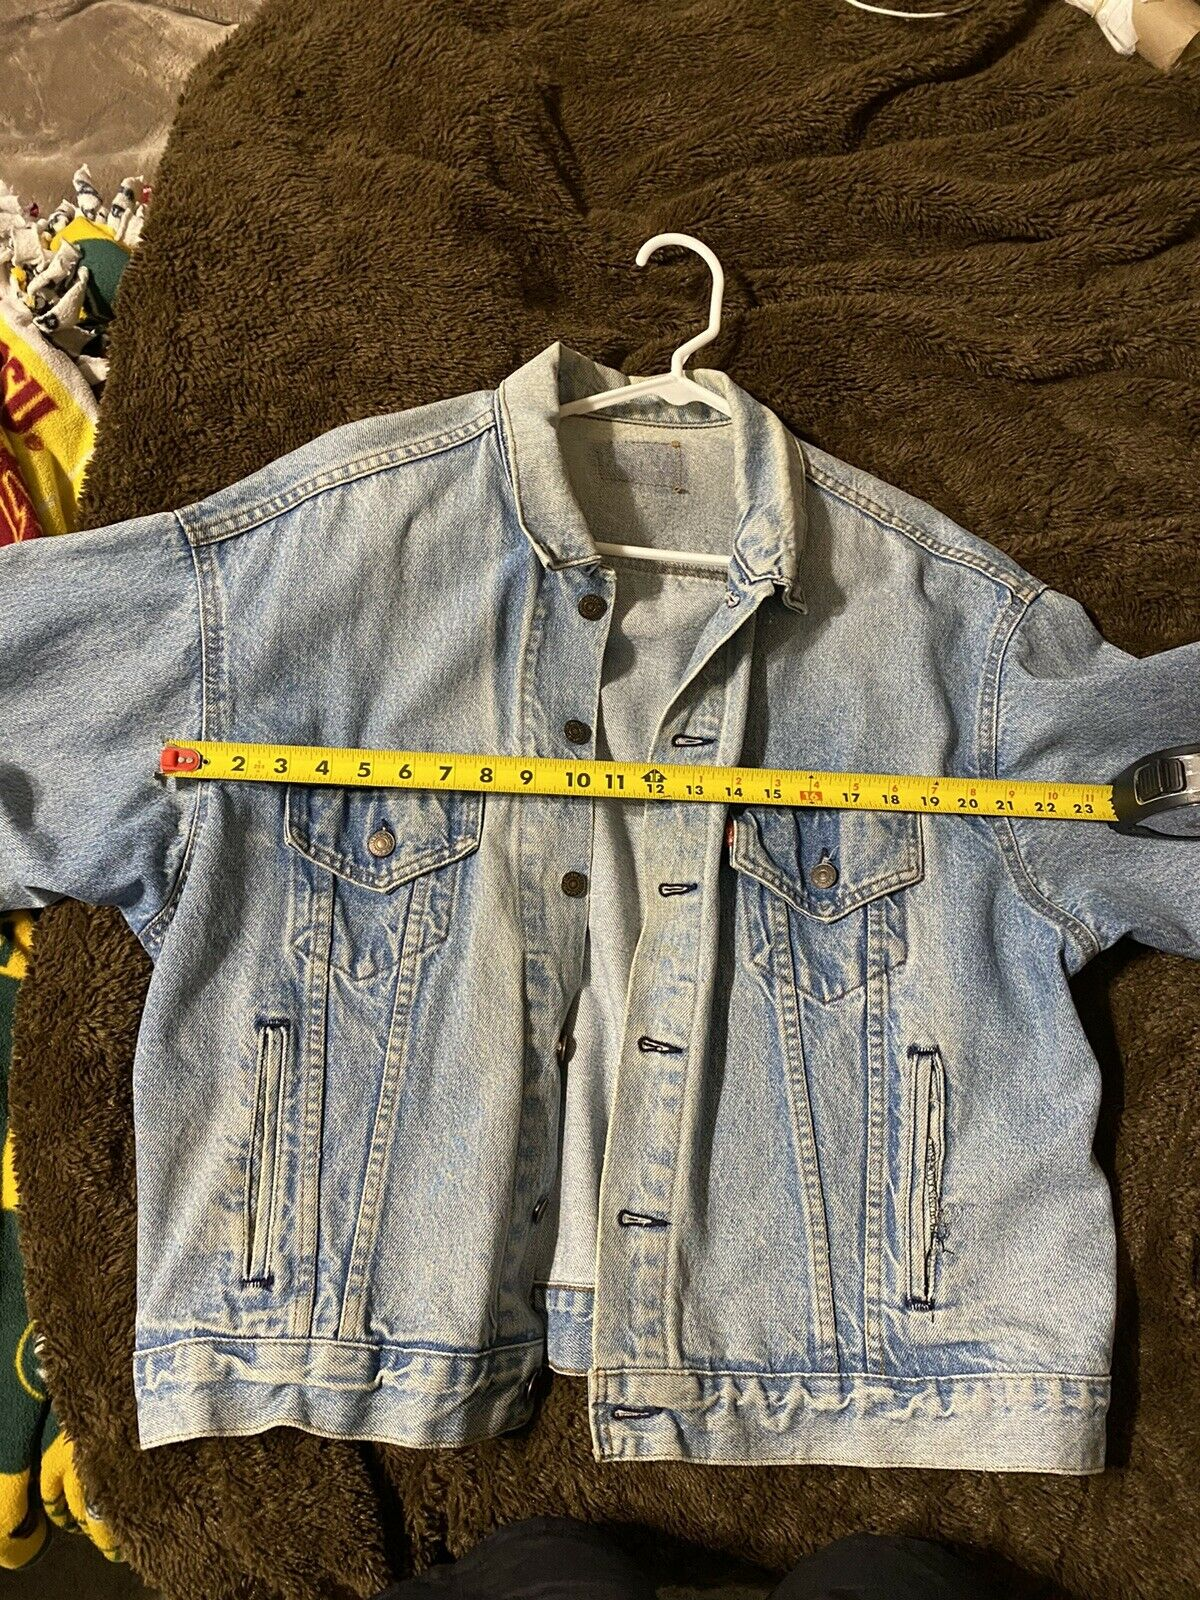 levis denim jacket made in usa - image 11